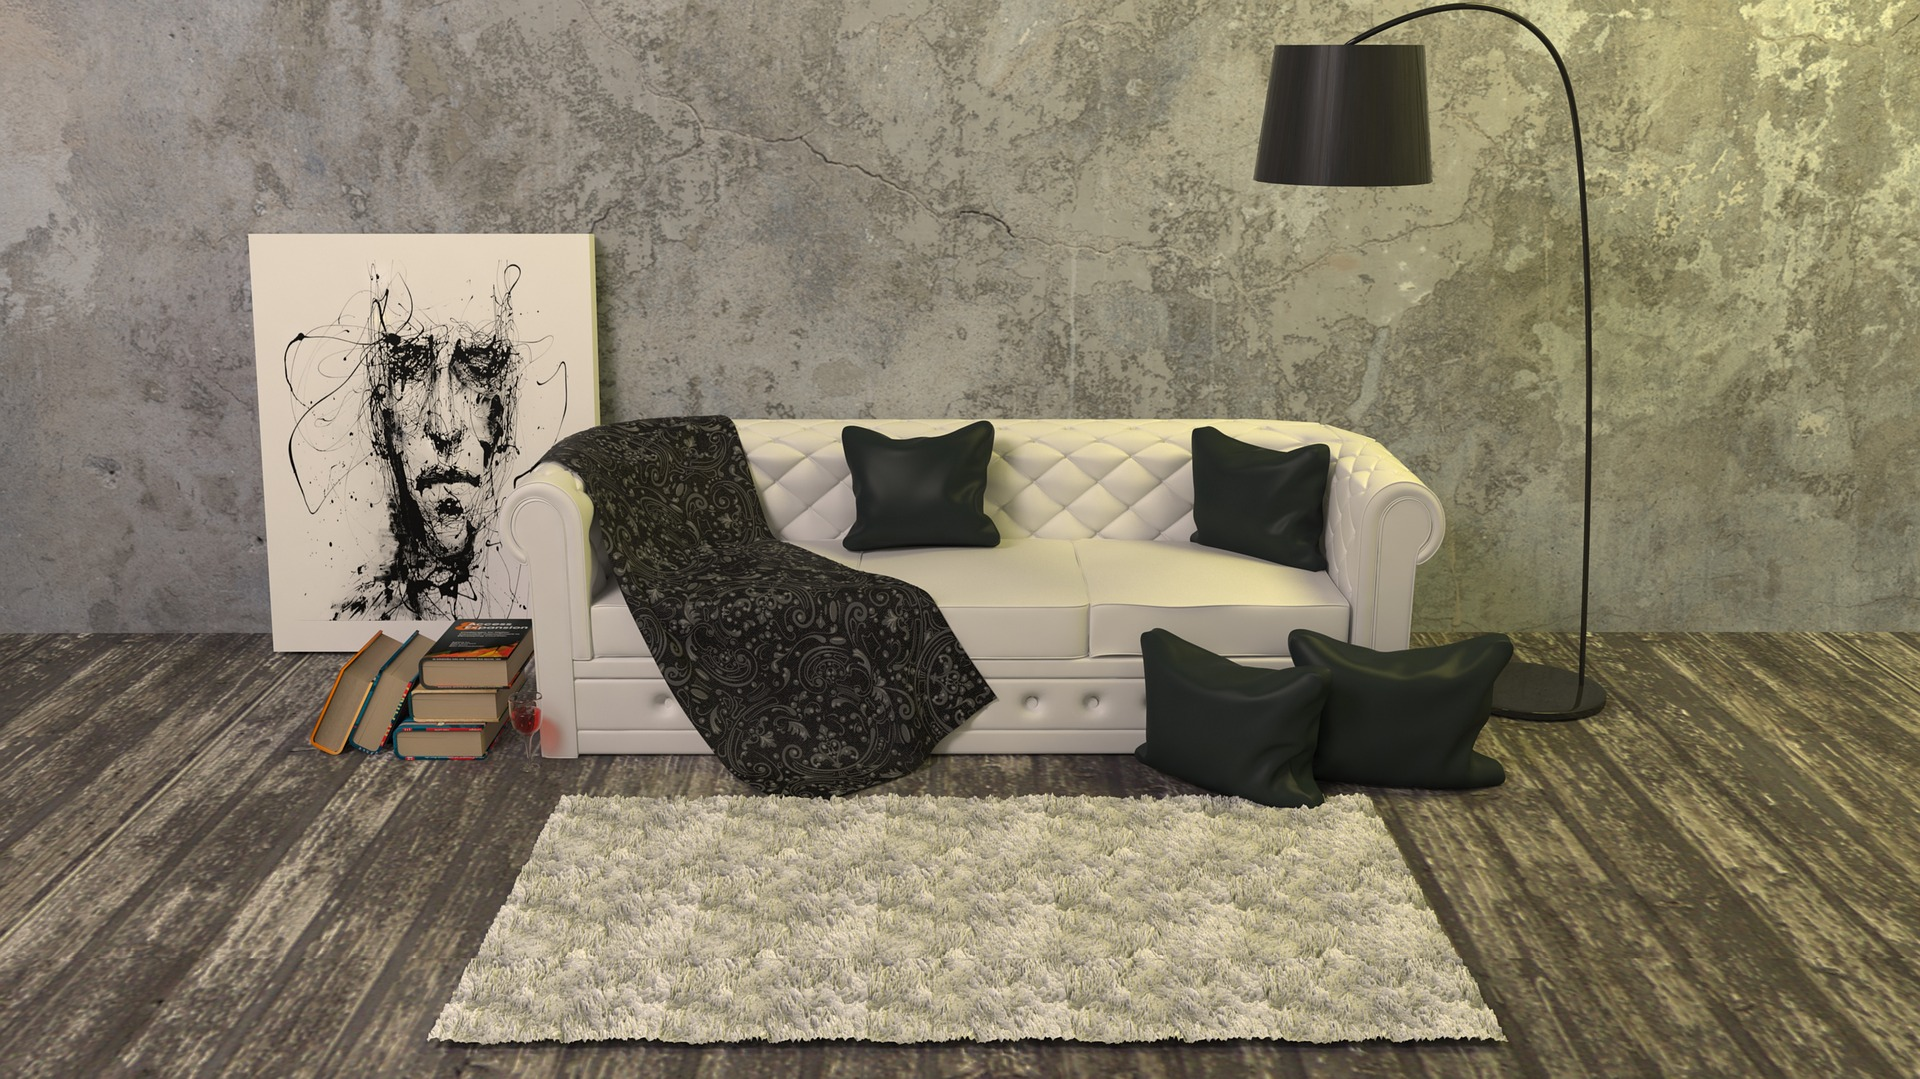 tapicería, maquinas de corte textil